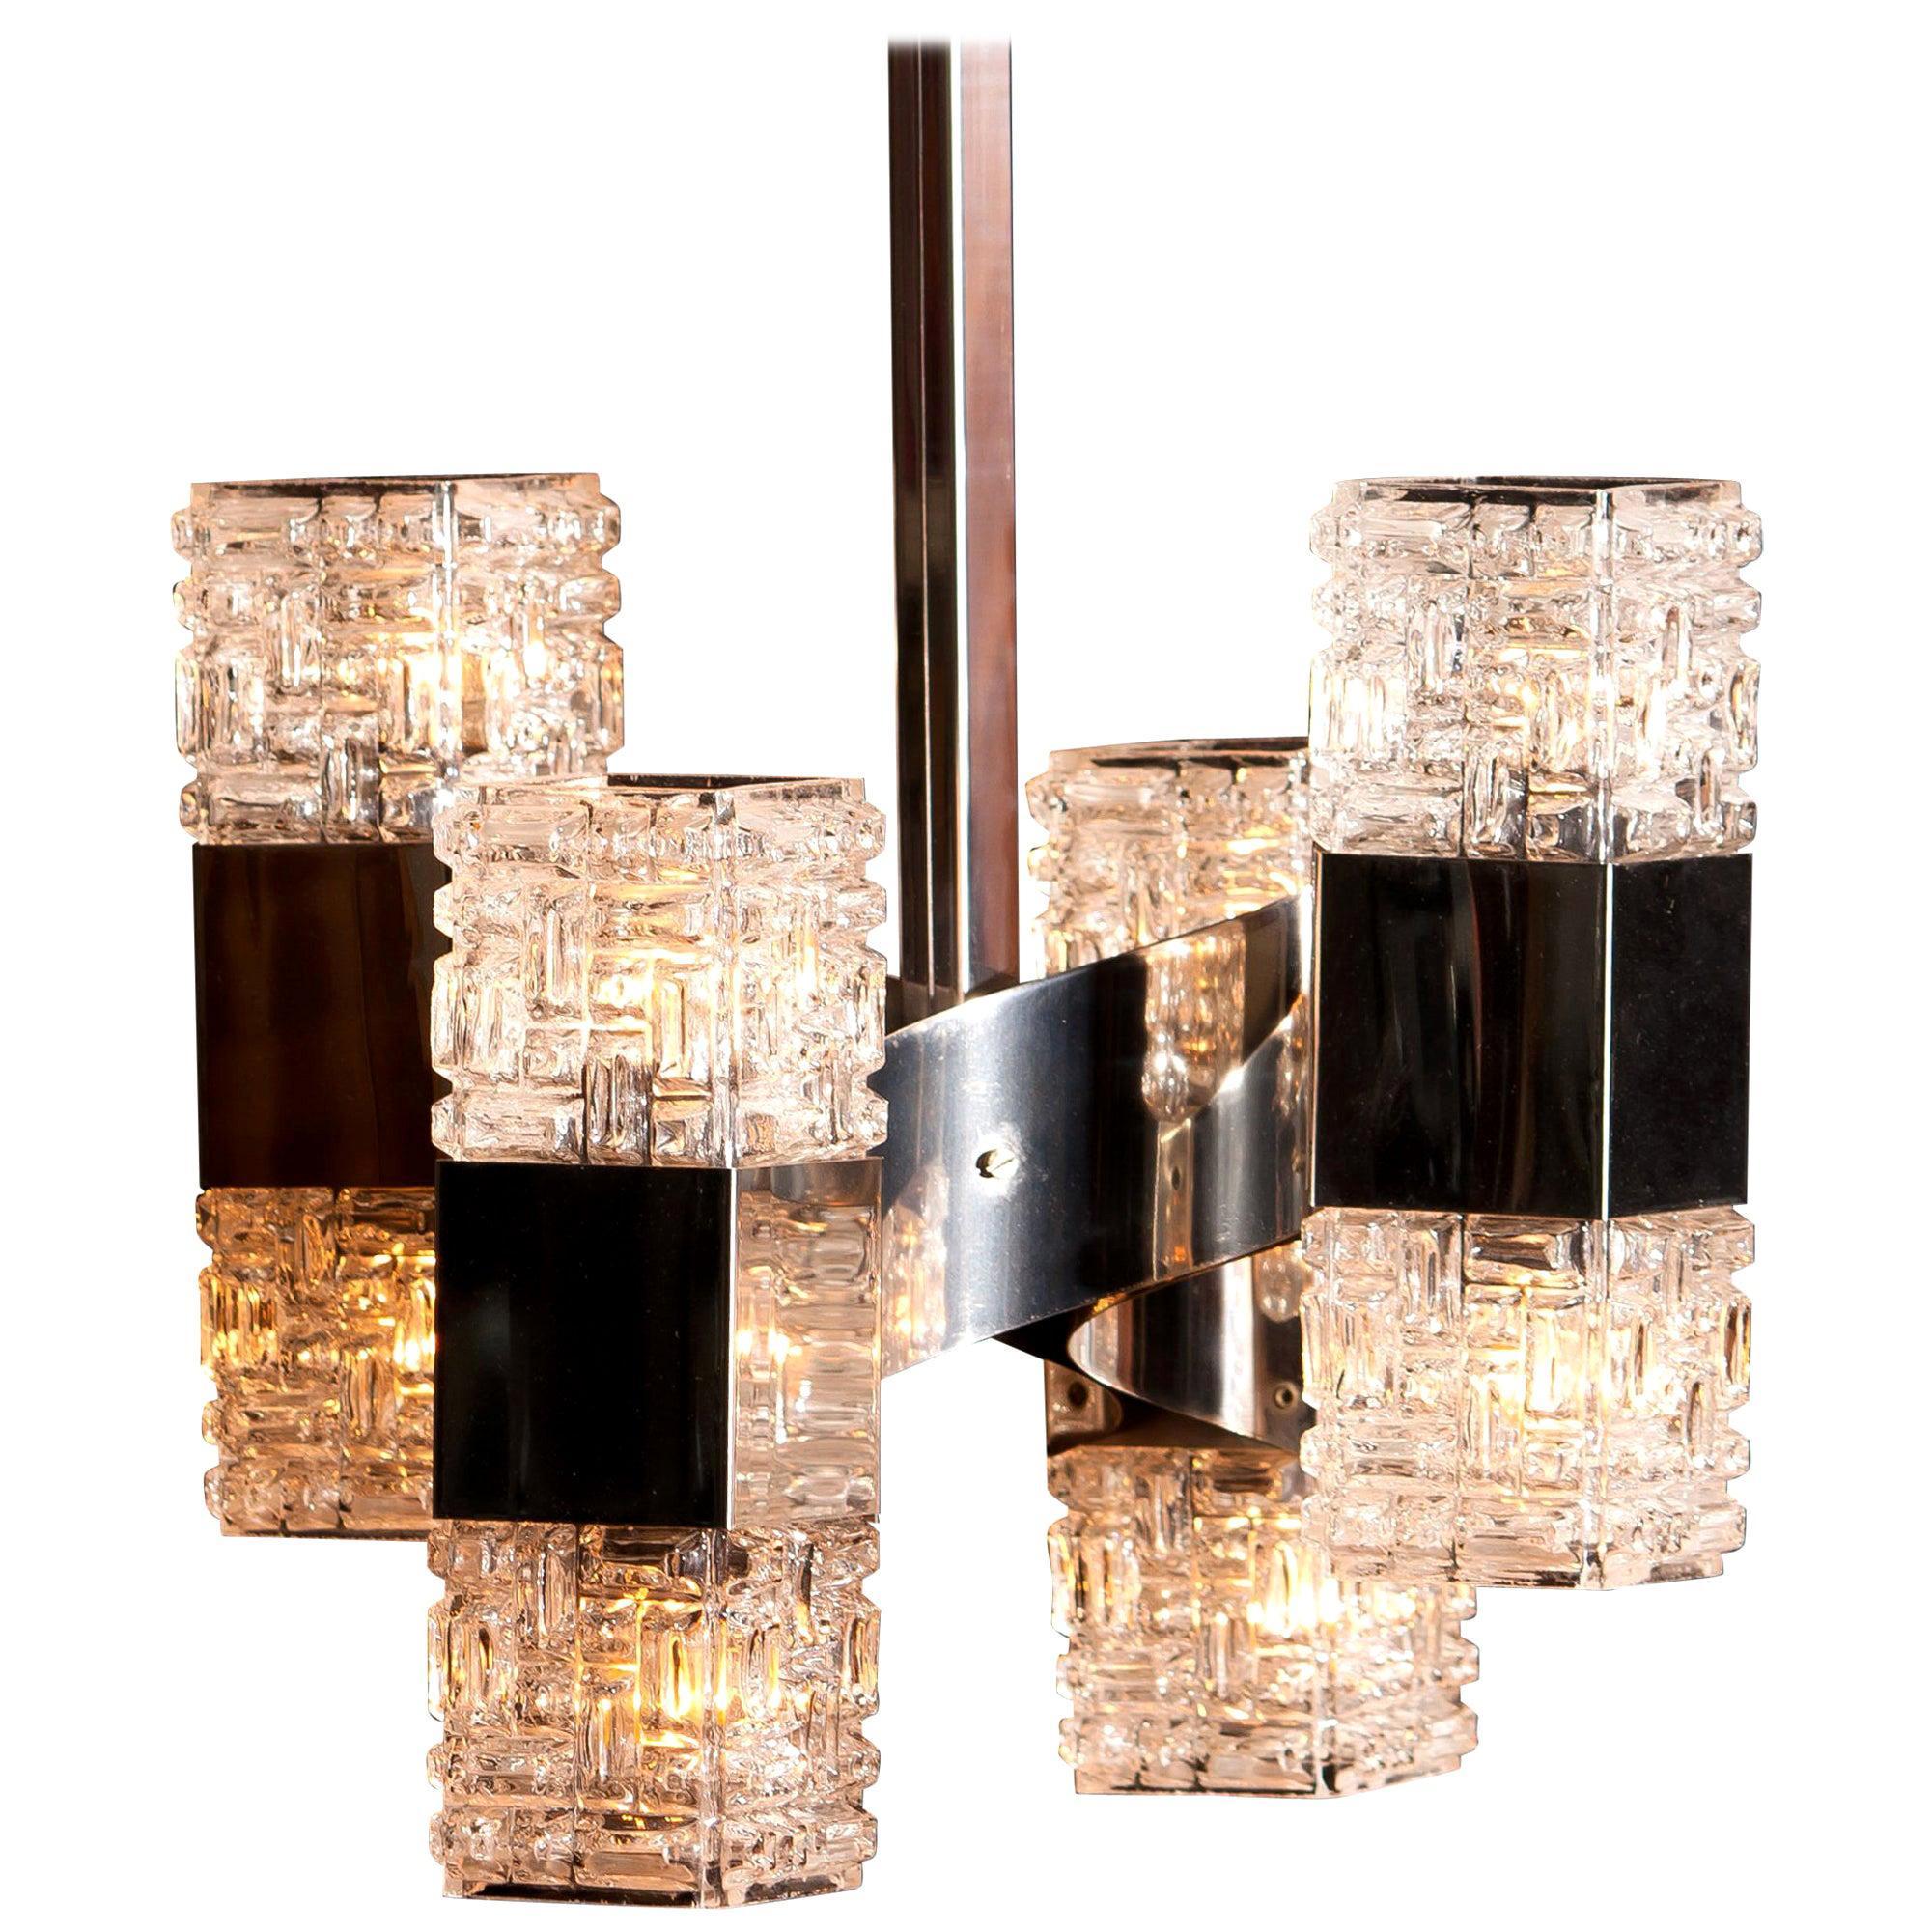 1960s, Chrome and Glass Pendant by Gaetano Sciolari, Italy